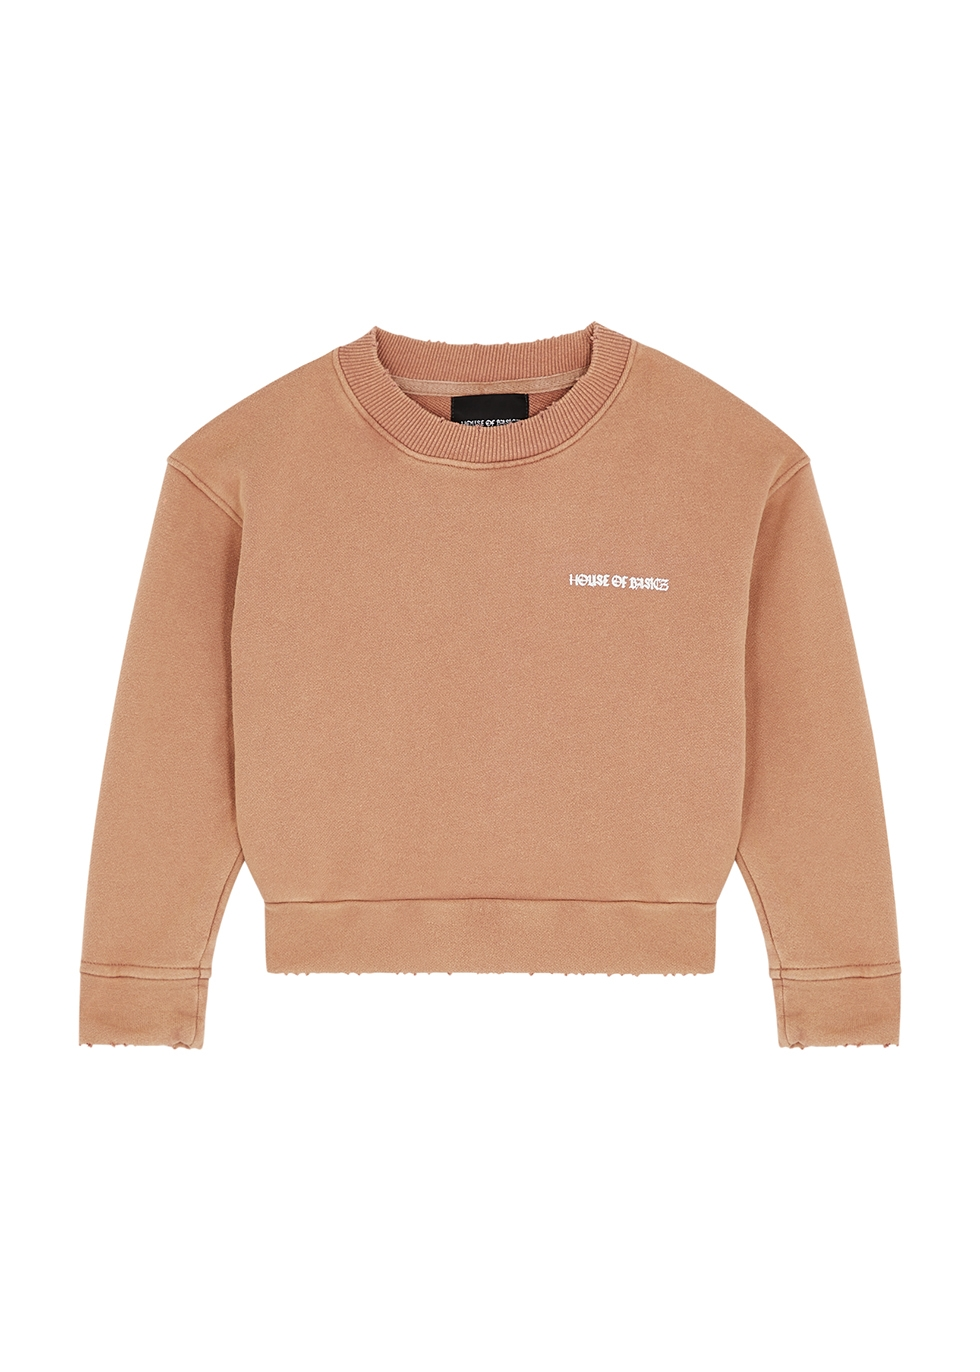 Dusky rose cotton sweatshirt (1-5 years)